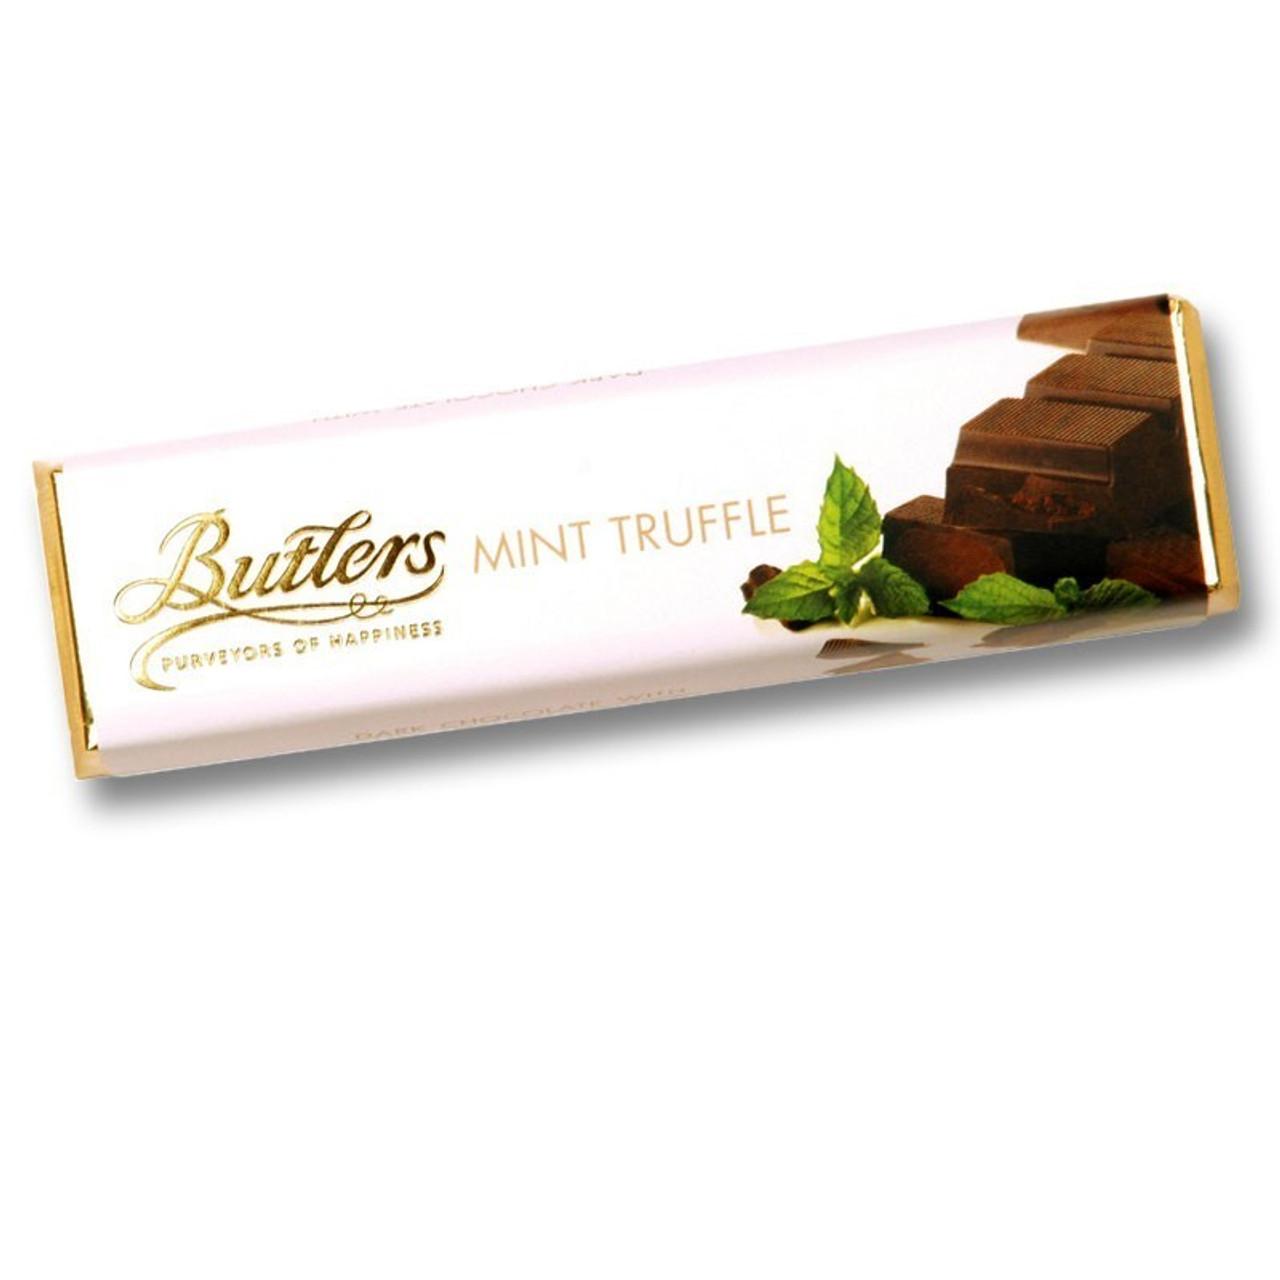 Butler's Mint Truffle Bar Dark Chocolate